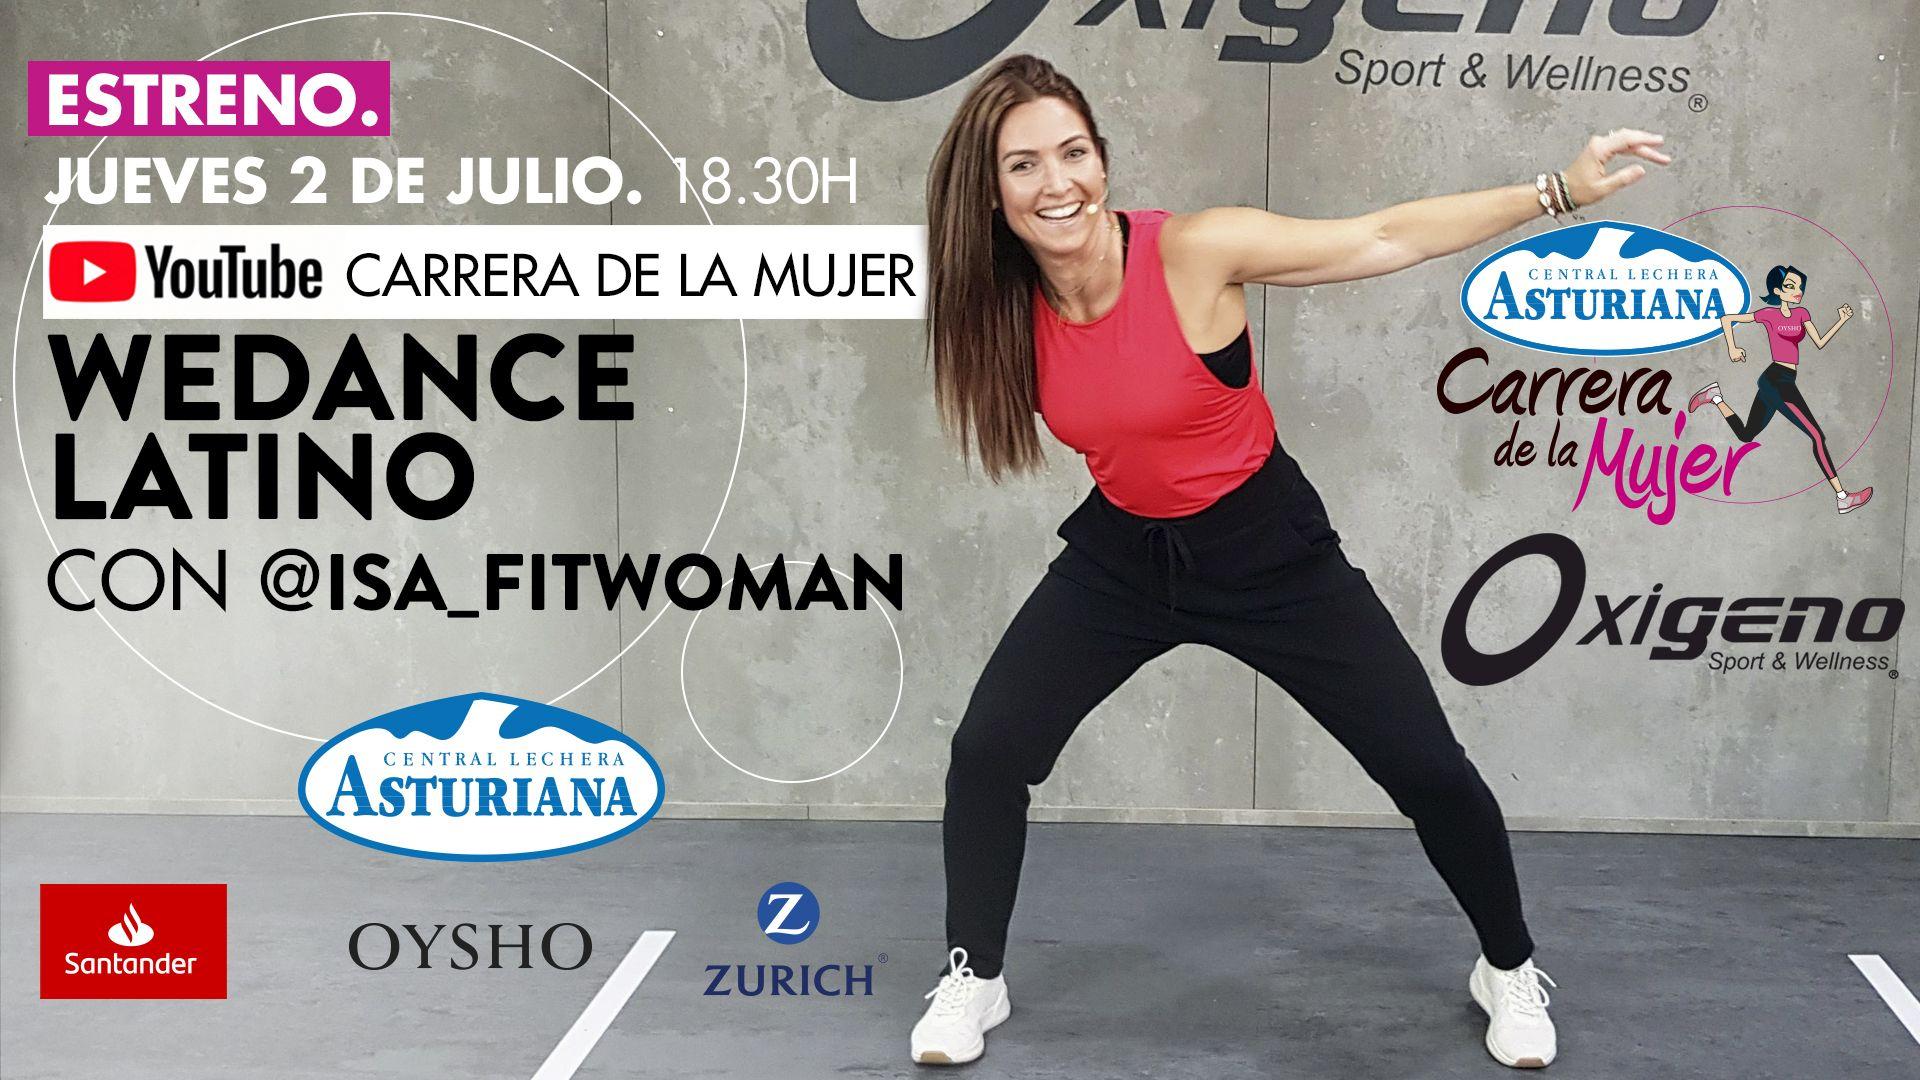 Únete a la clase de We Dance Latino